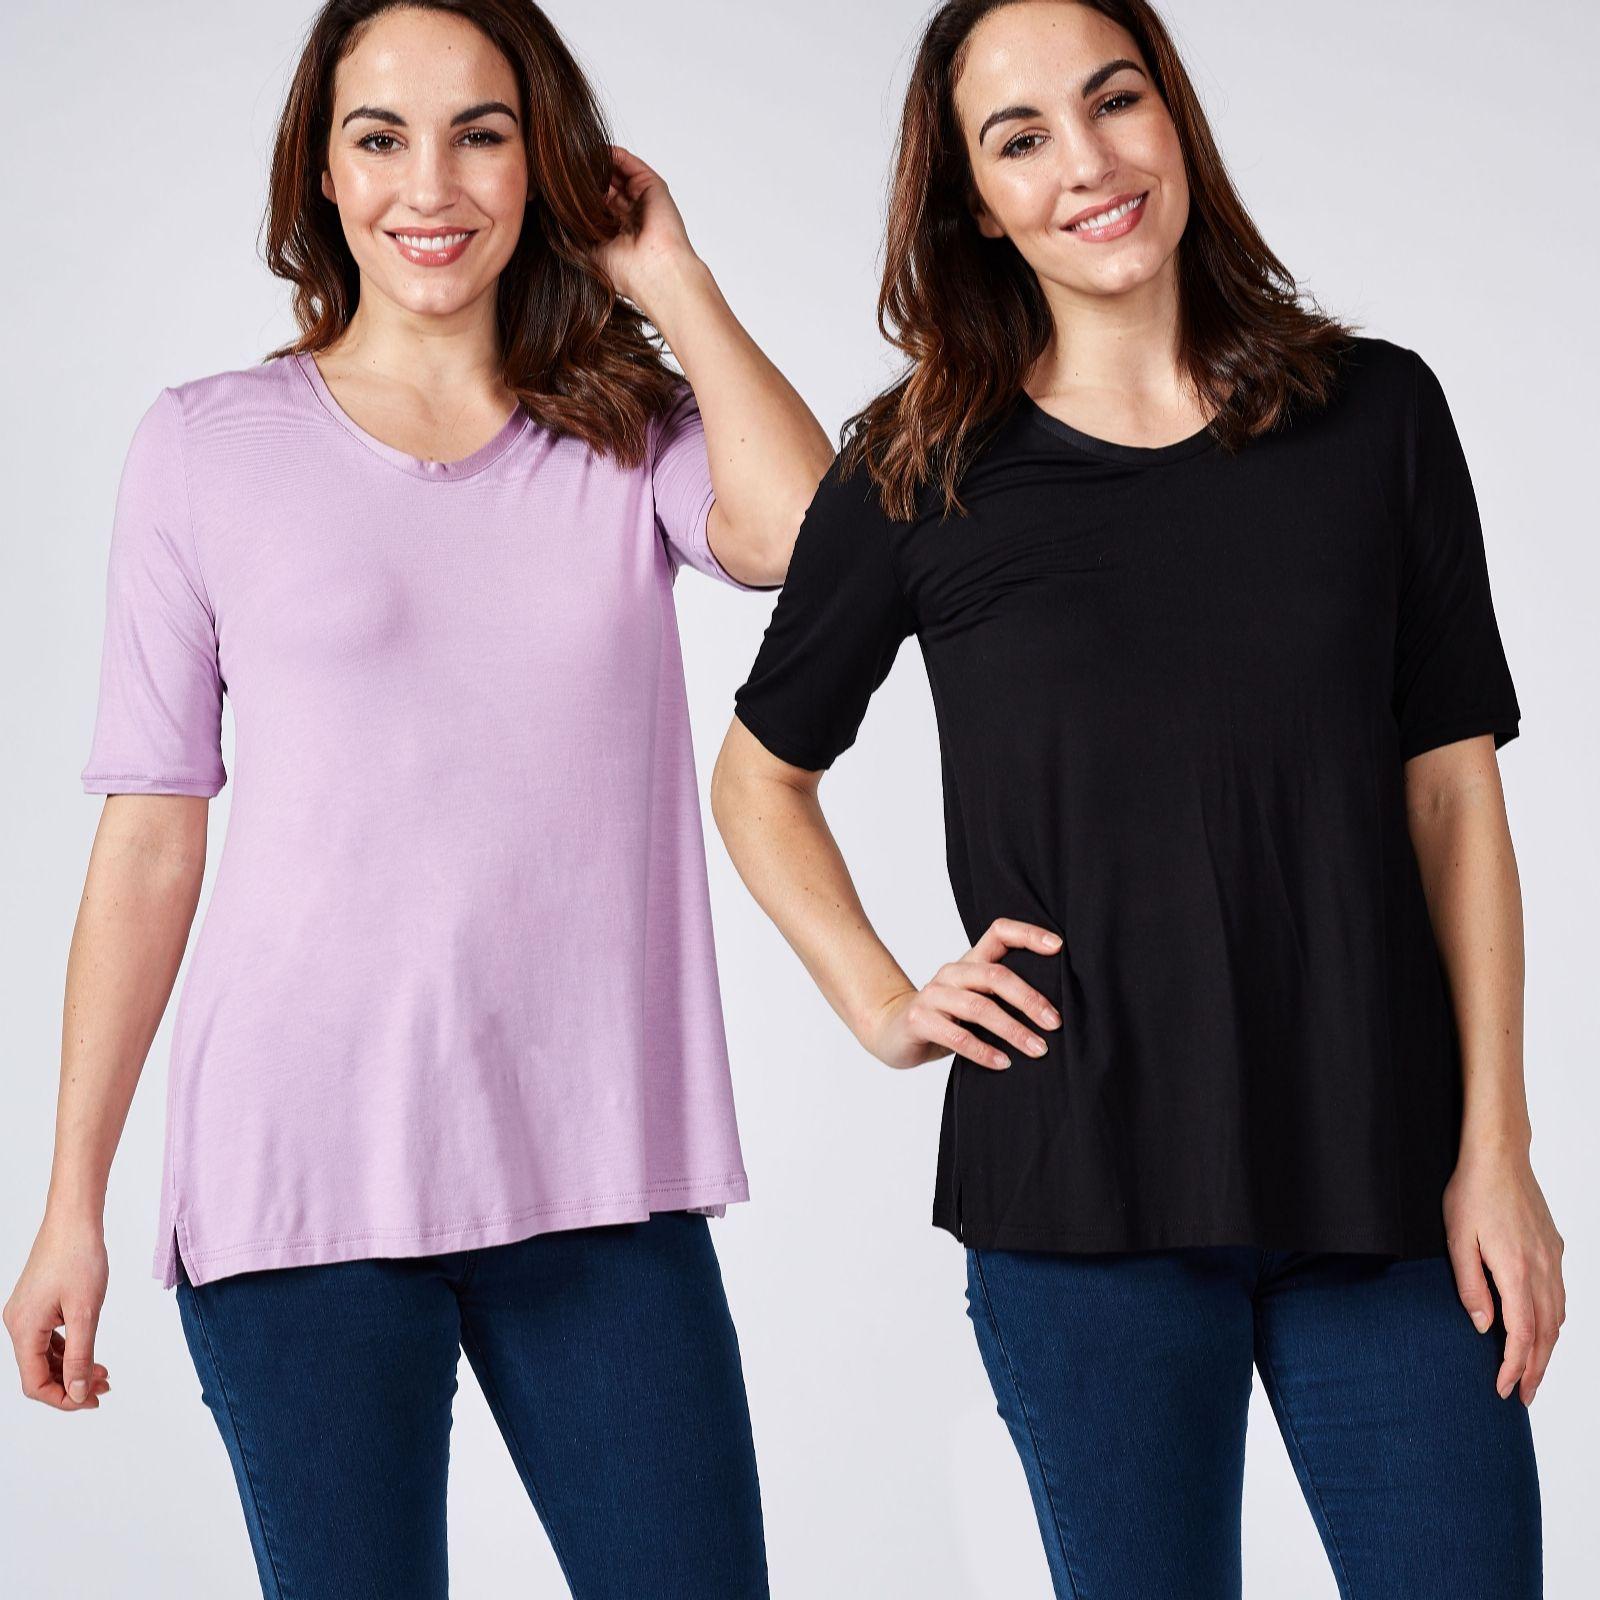 aea15d036e2 H by Halston Essentials Elbow Sleeve U Neck T Shirt 2 Pack - QVC UK